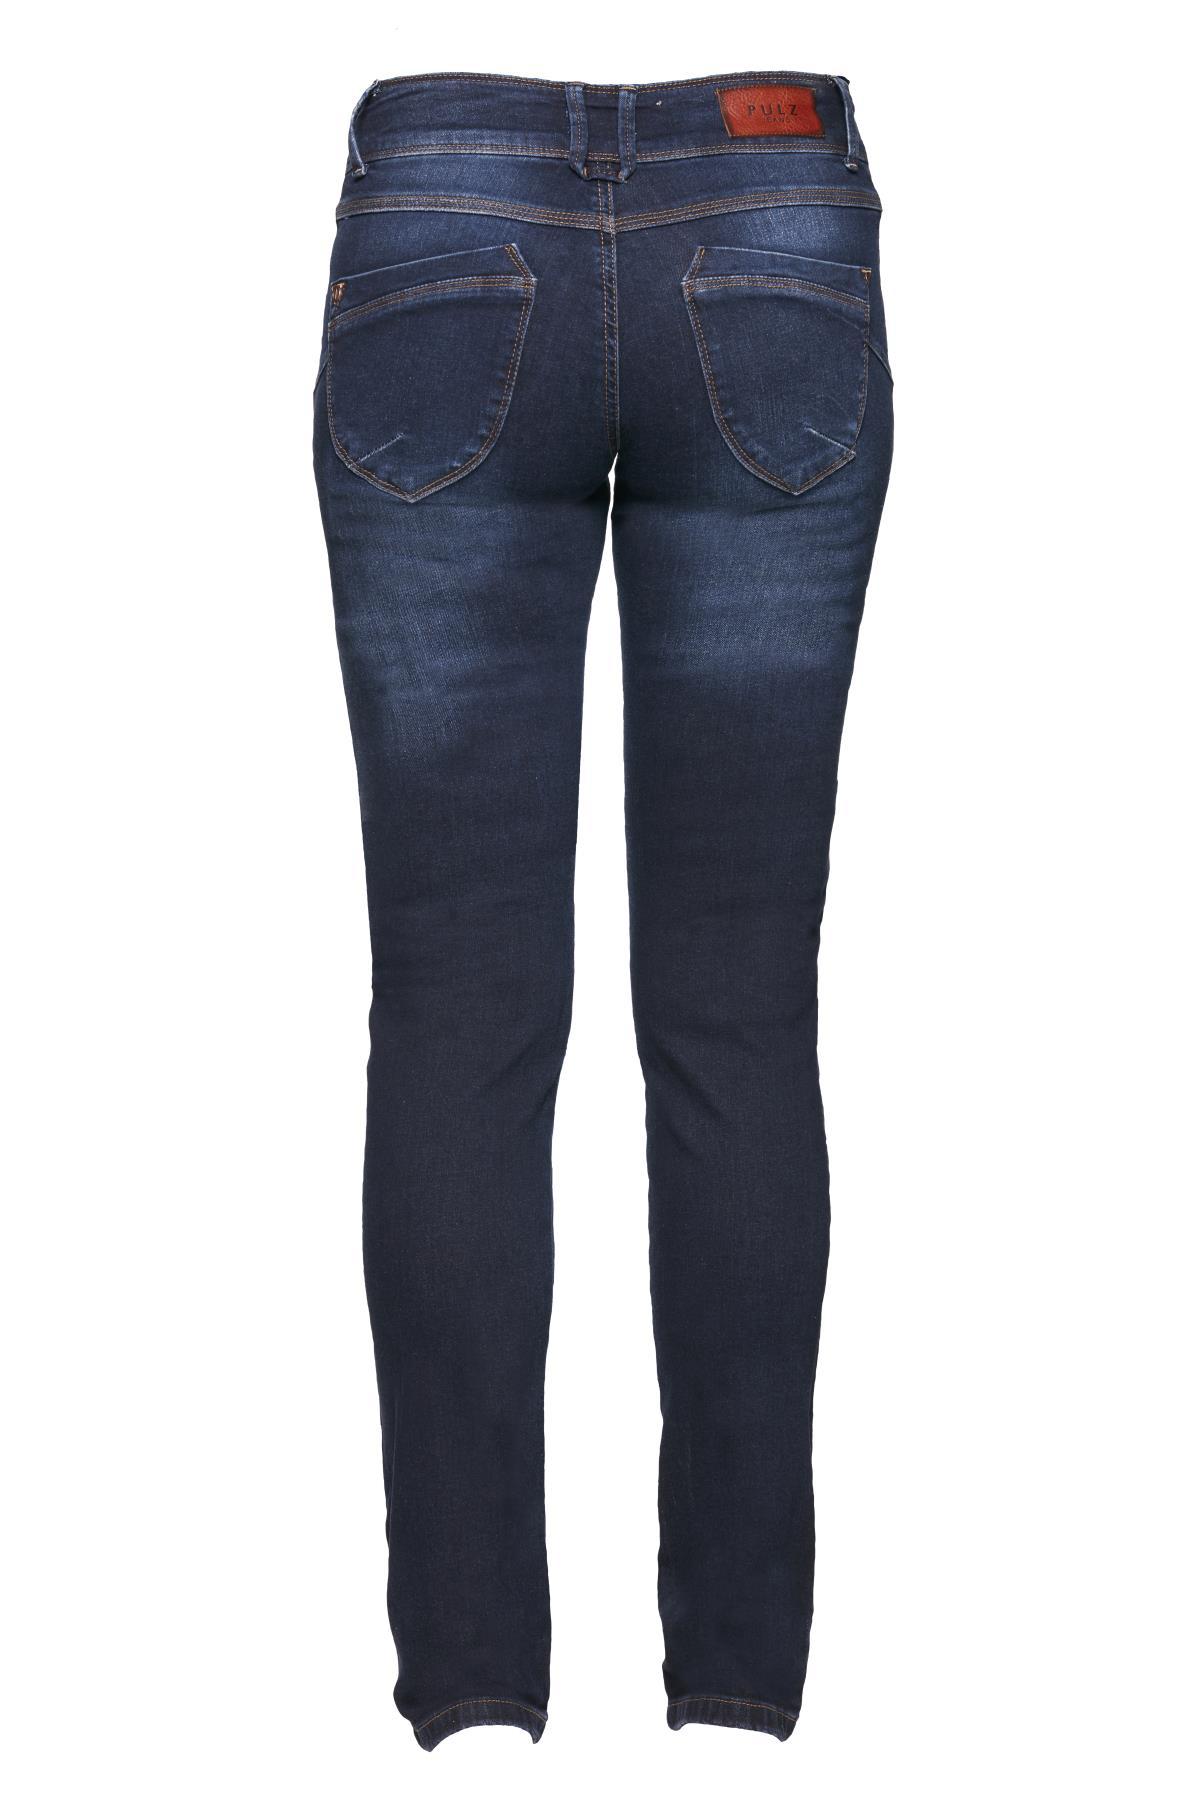 Mörk denimblå Jeans från Pulz Jeans – Köp Mörk denimblå Jeans från stl. 25-35 här